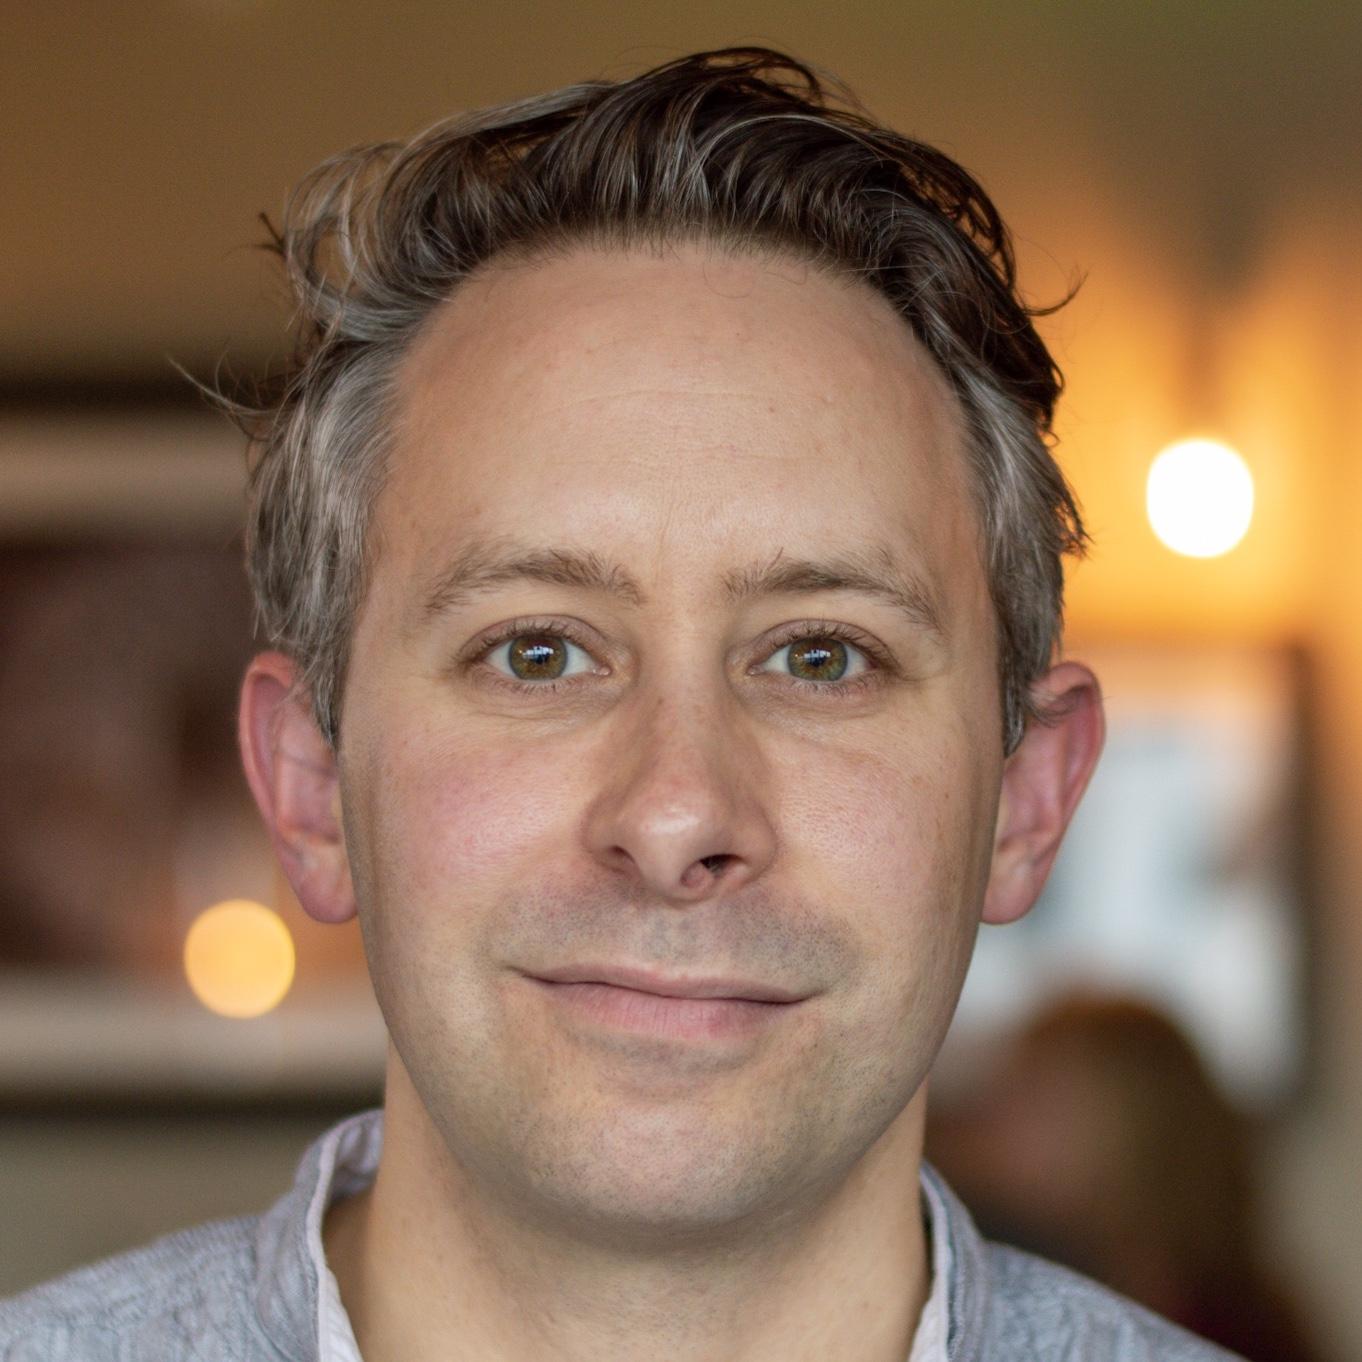 Benjamin Thomas; Post Graduate Researcher at Sociology, Social Policy, and Criminology School, University of Southampton